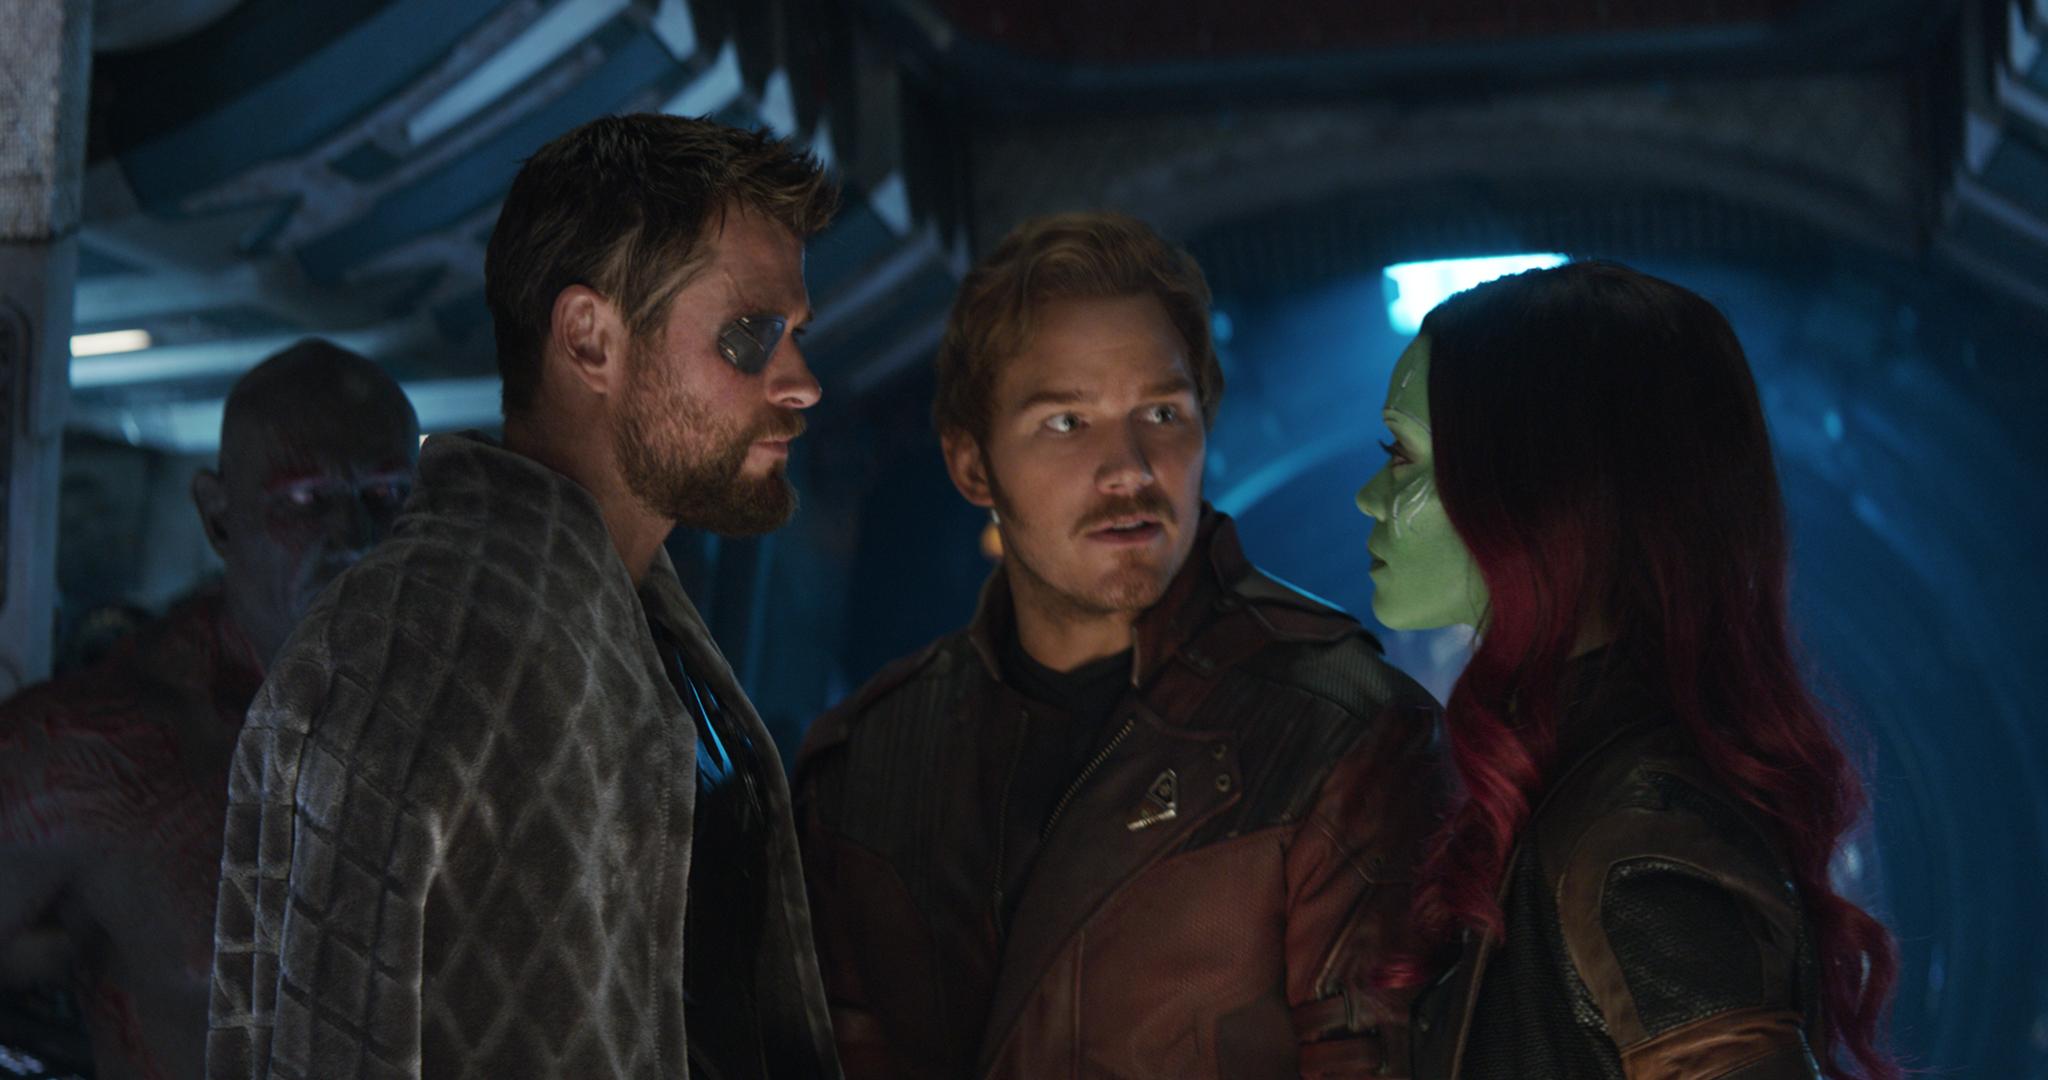 Avengers: Infinity War Gag Reel Clip Is Full of Funny Faces